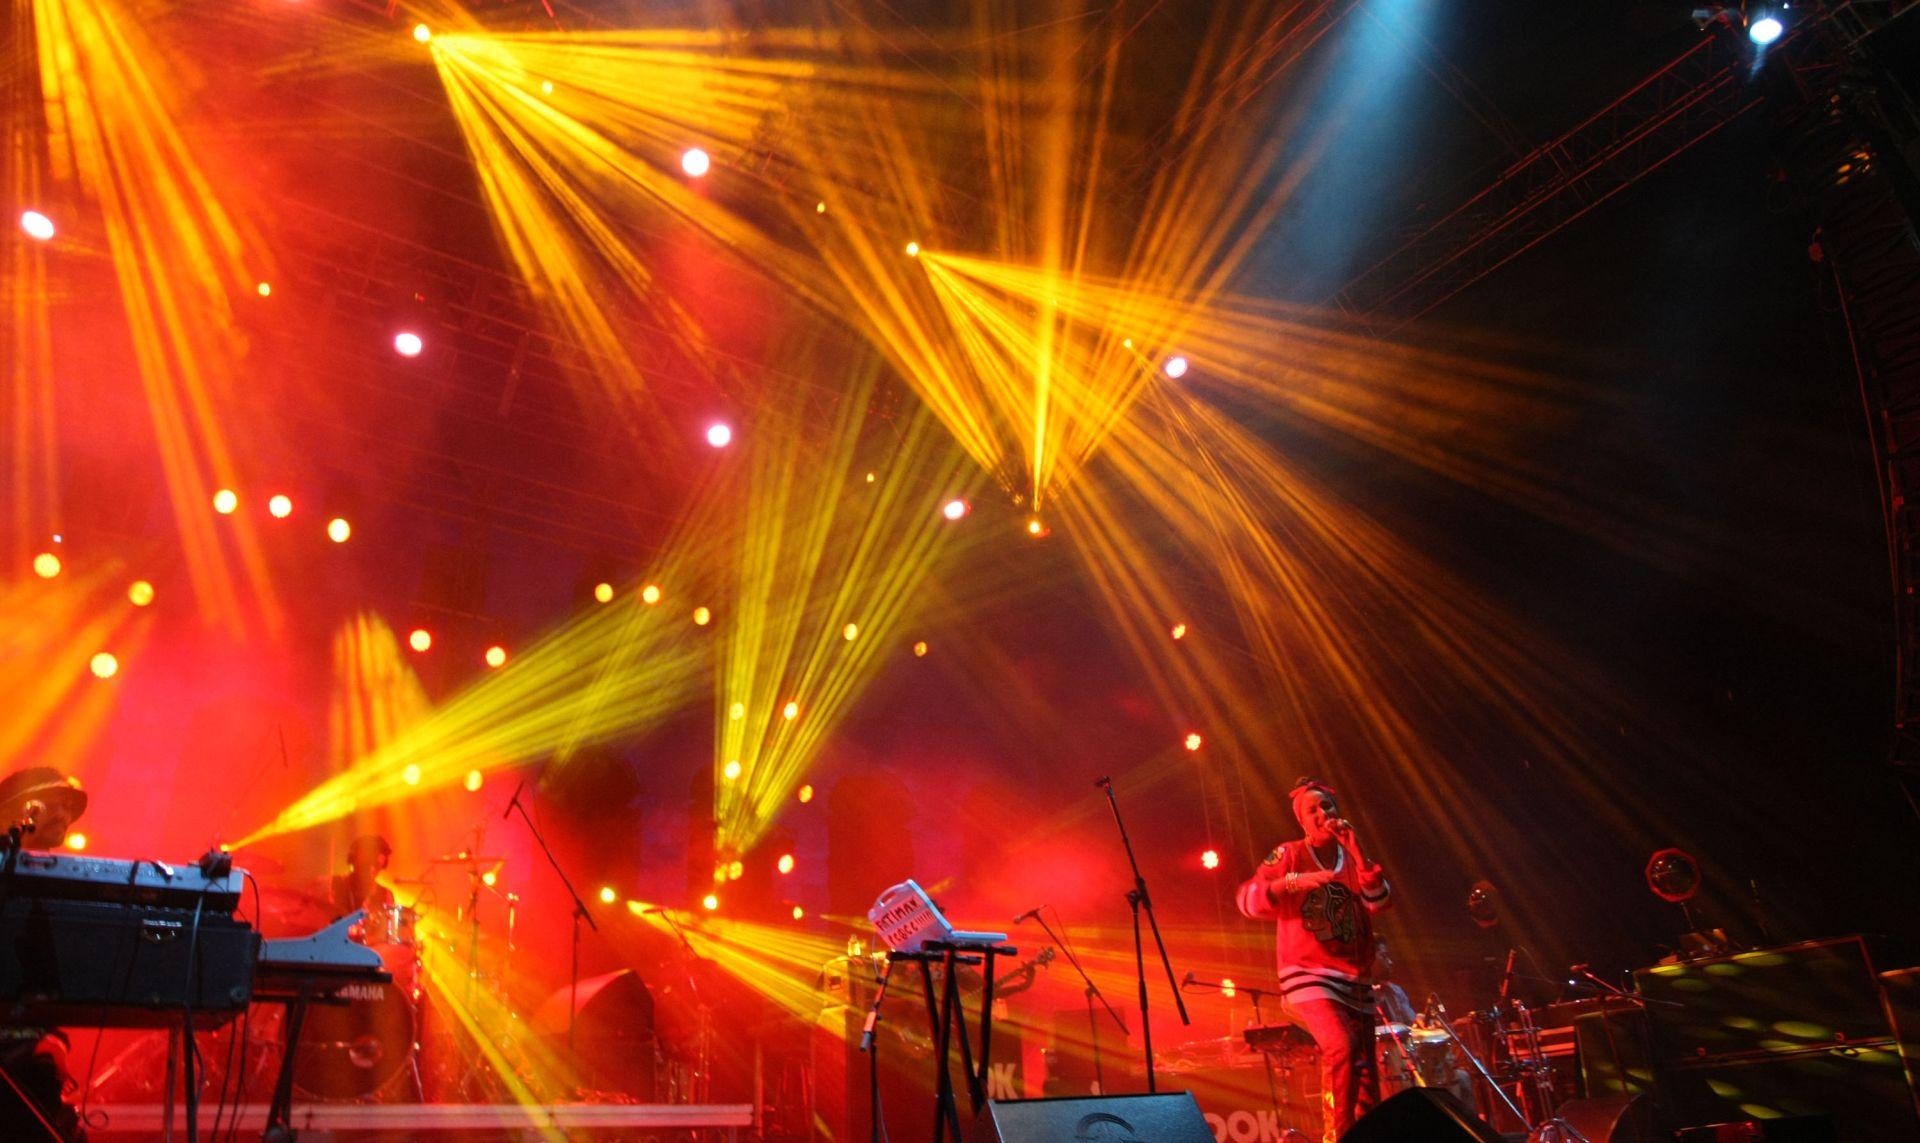 U Puli počeo Outlook festival elektronske glazbe